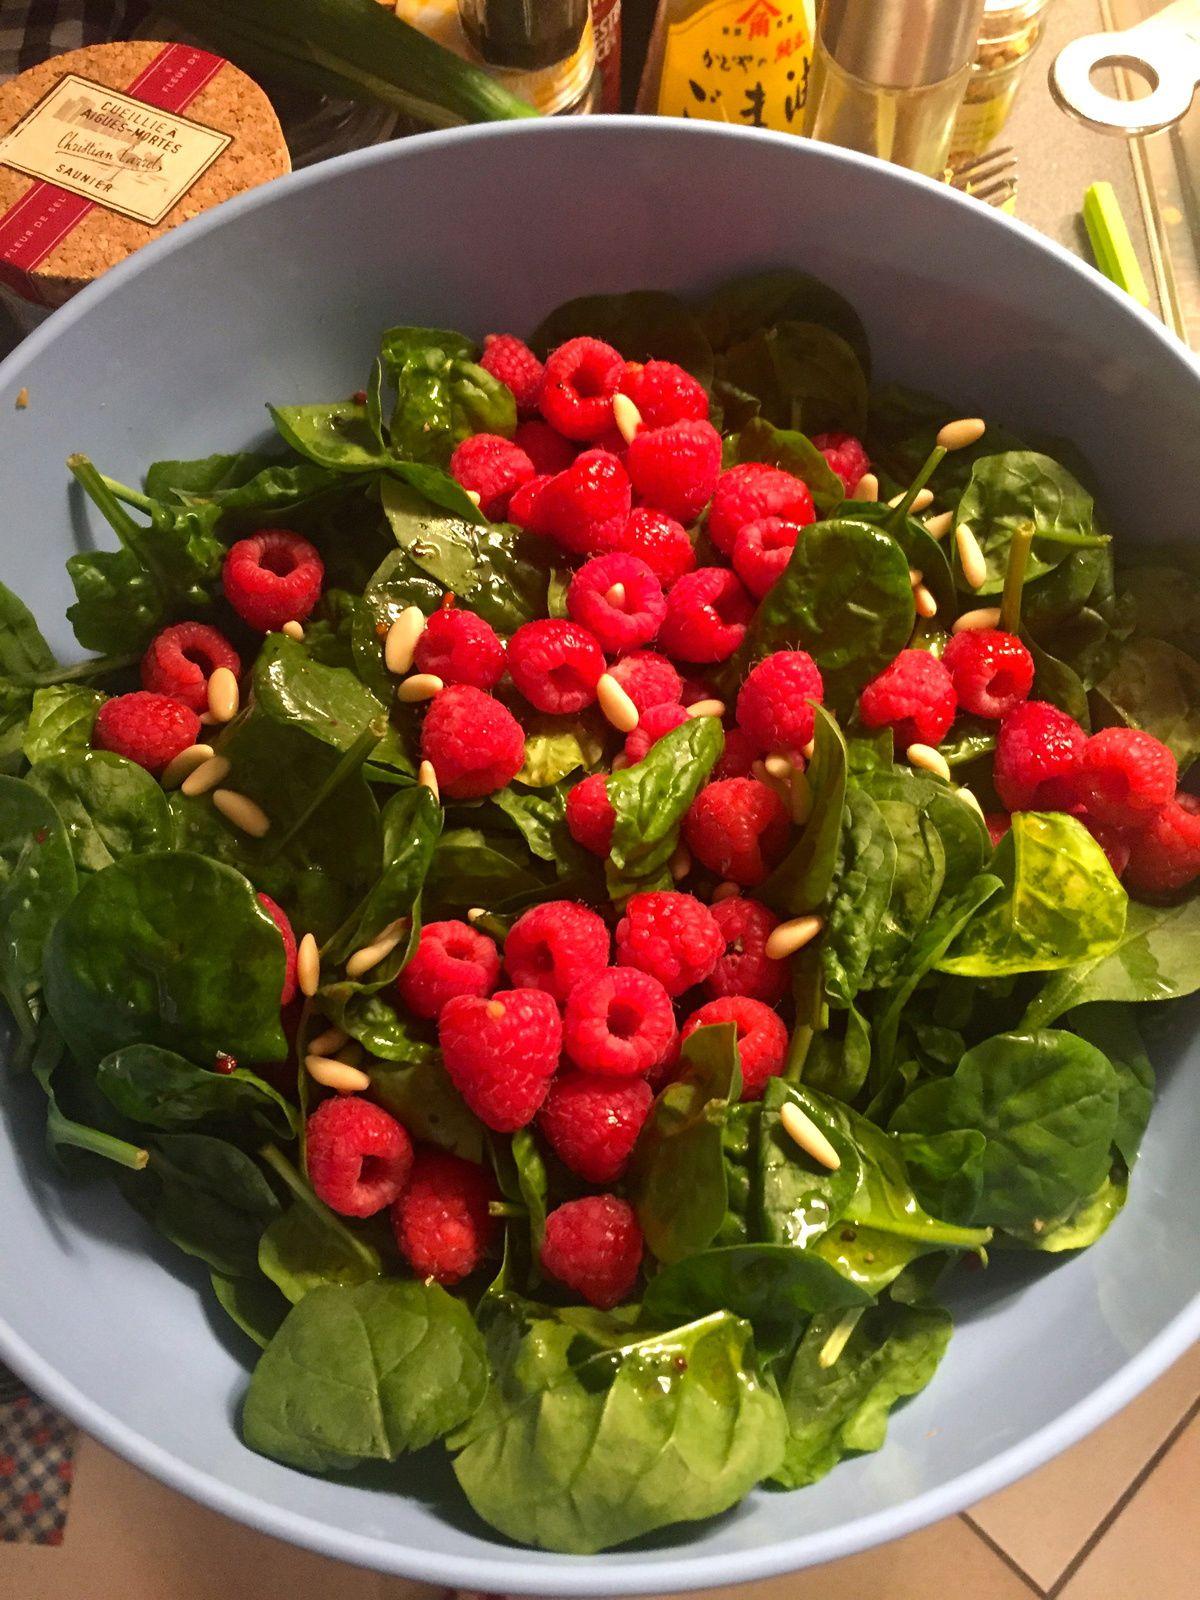 Salade d'épinards crus et framboise